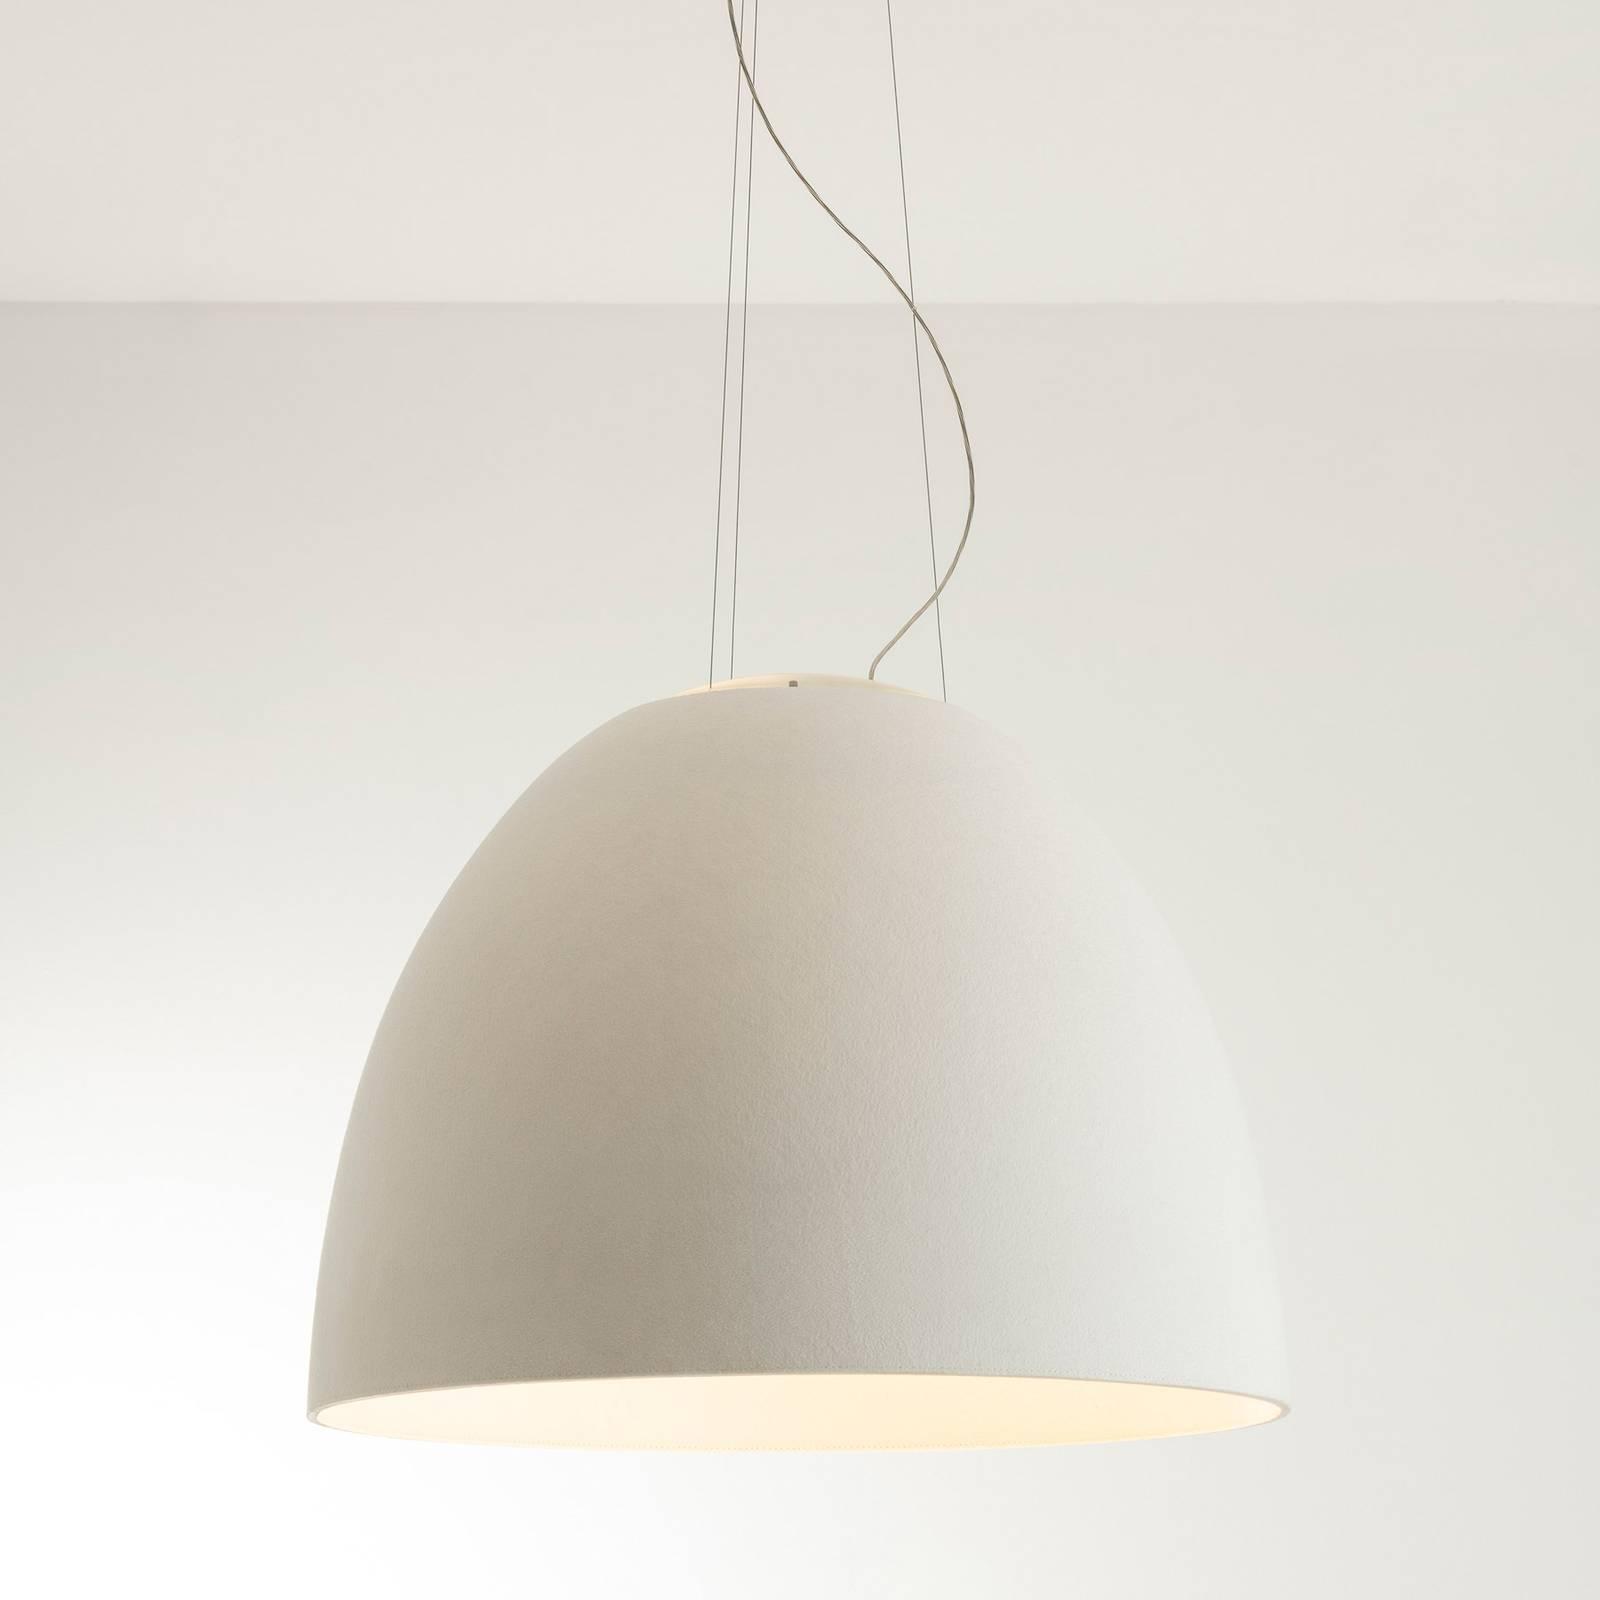 Artemide Nur Acoustic LED-Hängeleuchte, weiß